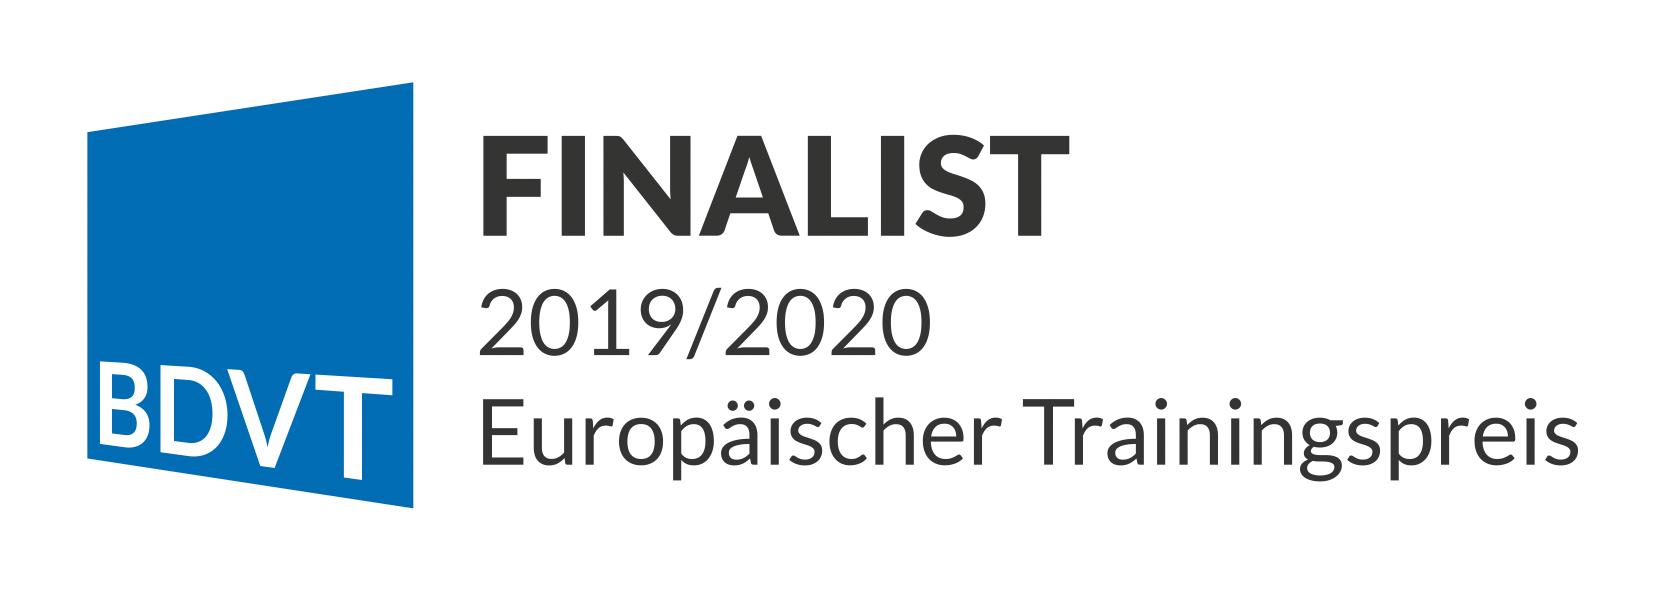 BDVT ETP 2019 Logo Finalist